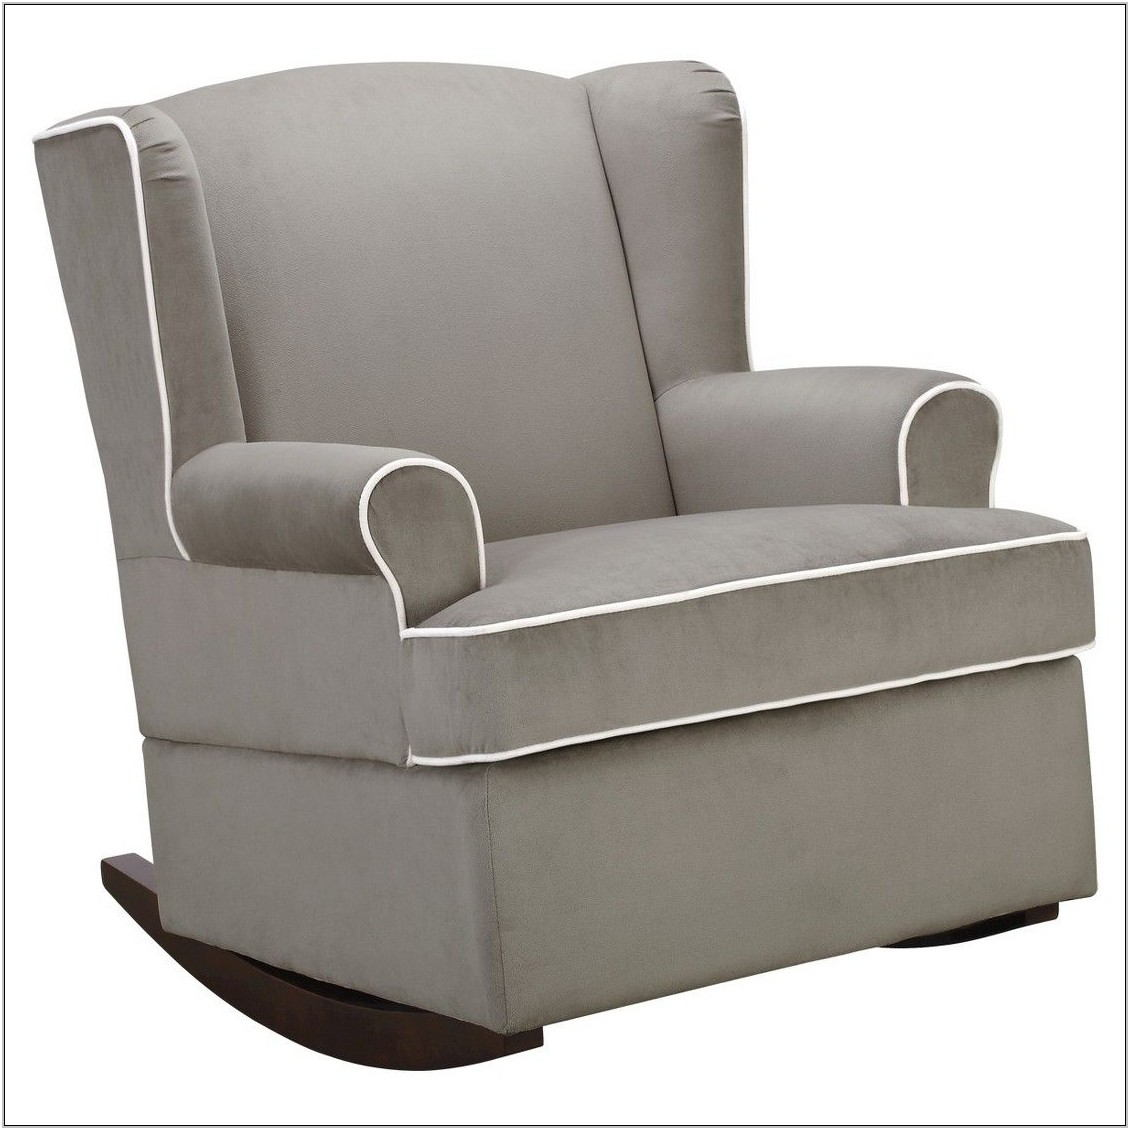 Eddie Bauer Living Room Furniture